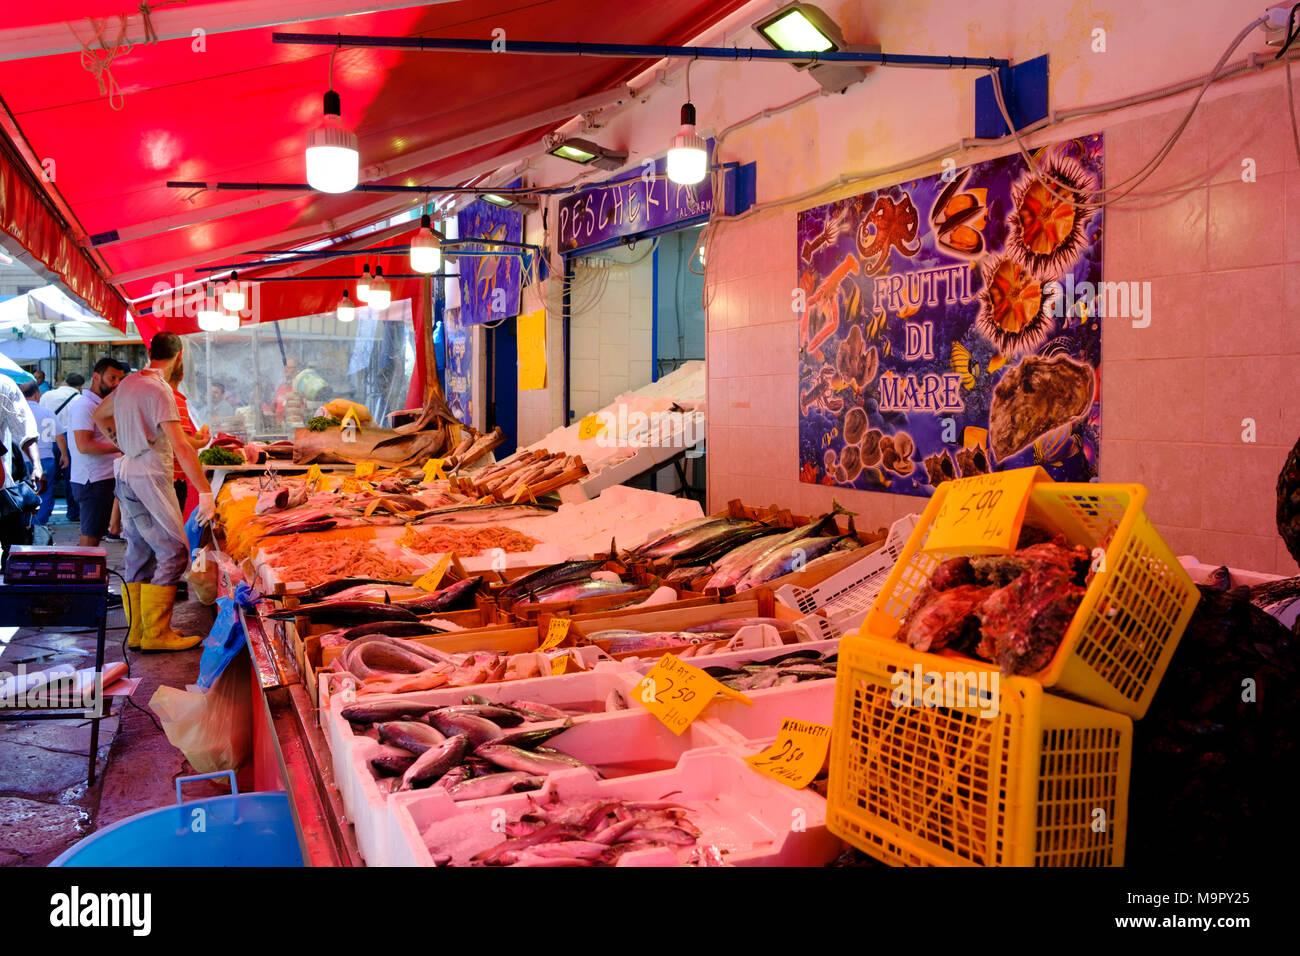 Fish market, Ballaro market, Mercato di Ballaro, Palermo, Sicily, Italy - Stock Image